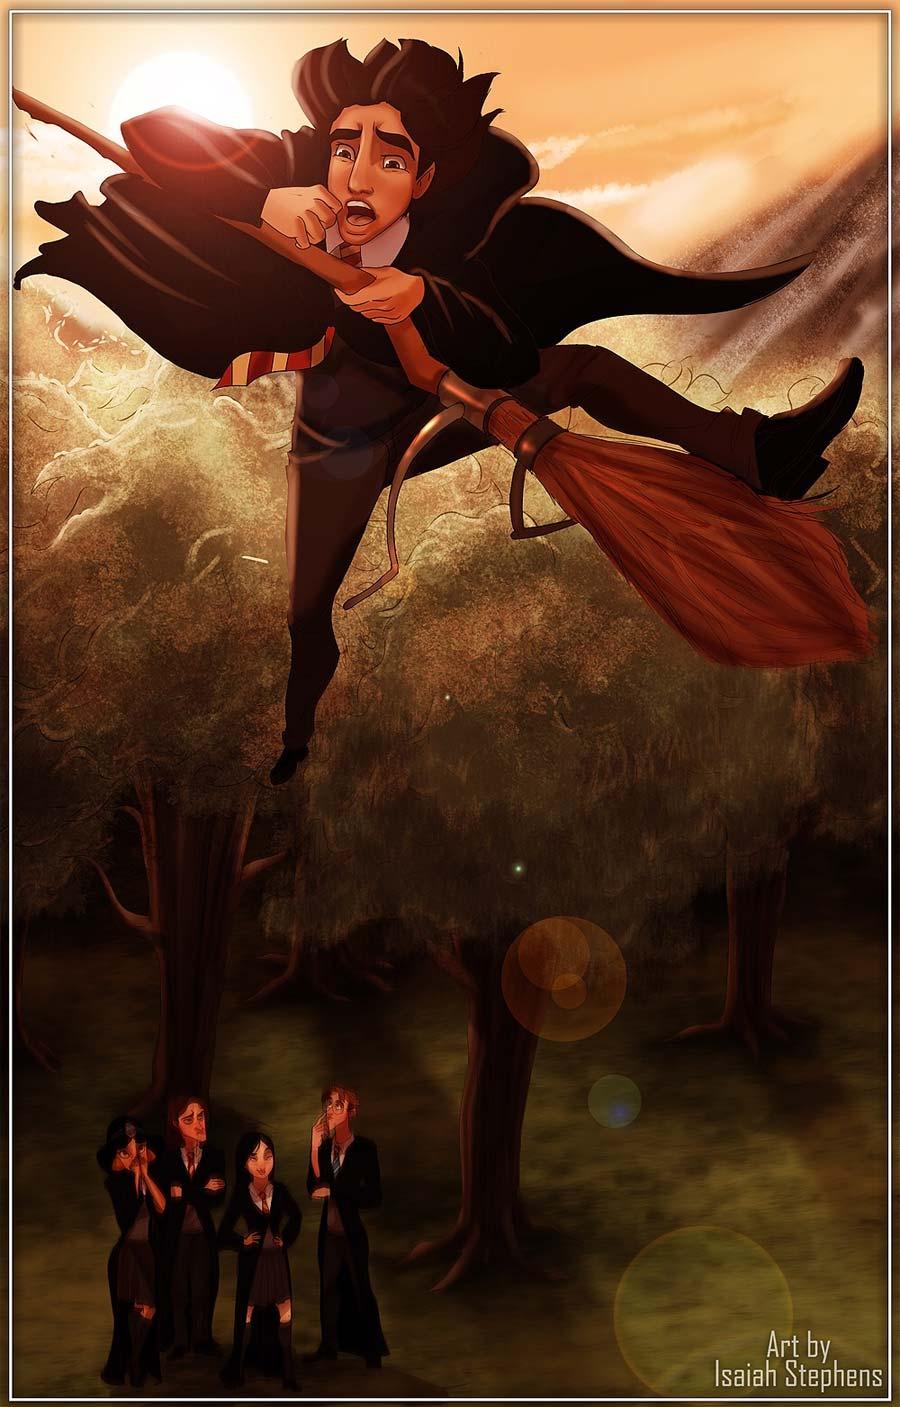 disney-ilustracoes-harrypotter-hogwarts-005